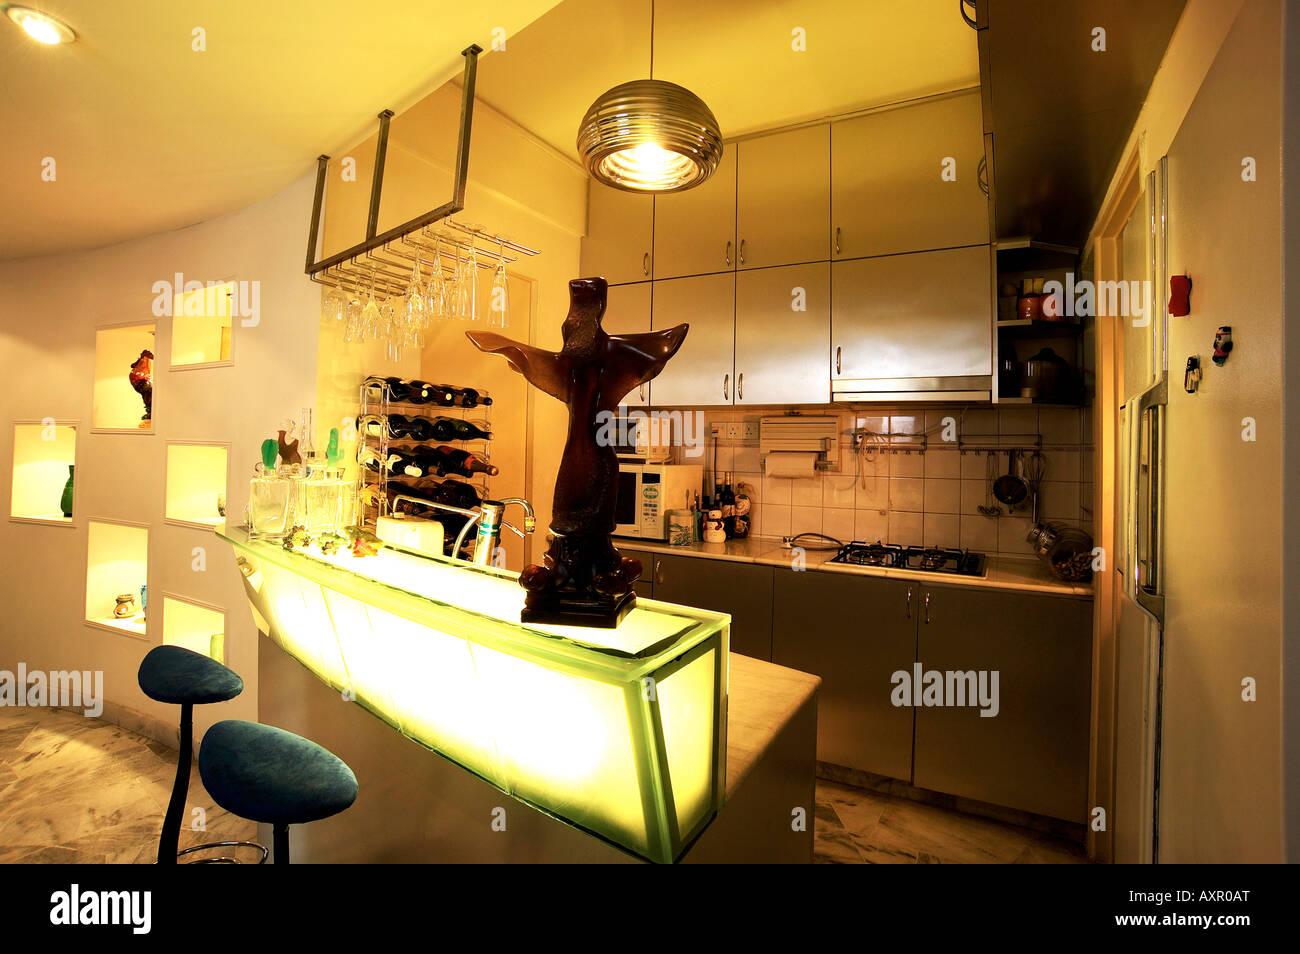 Tolle Minibar Küche Ideen - Images for inspirierende Ideen für ...